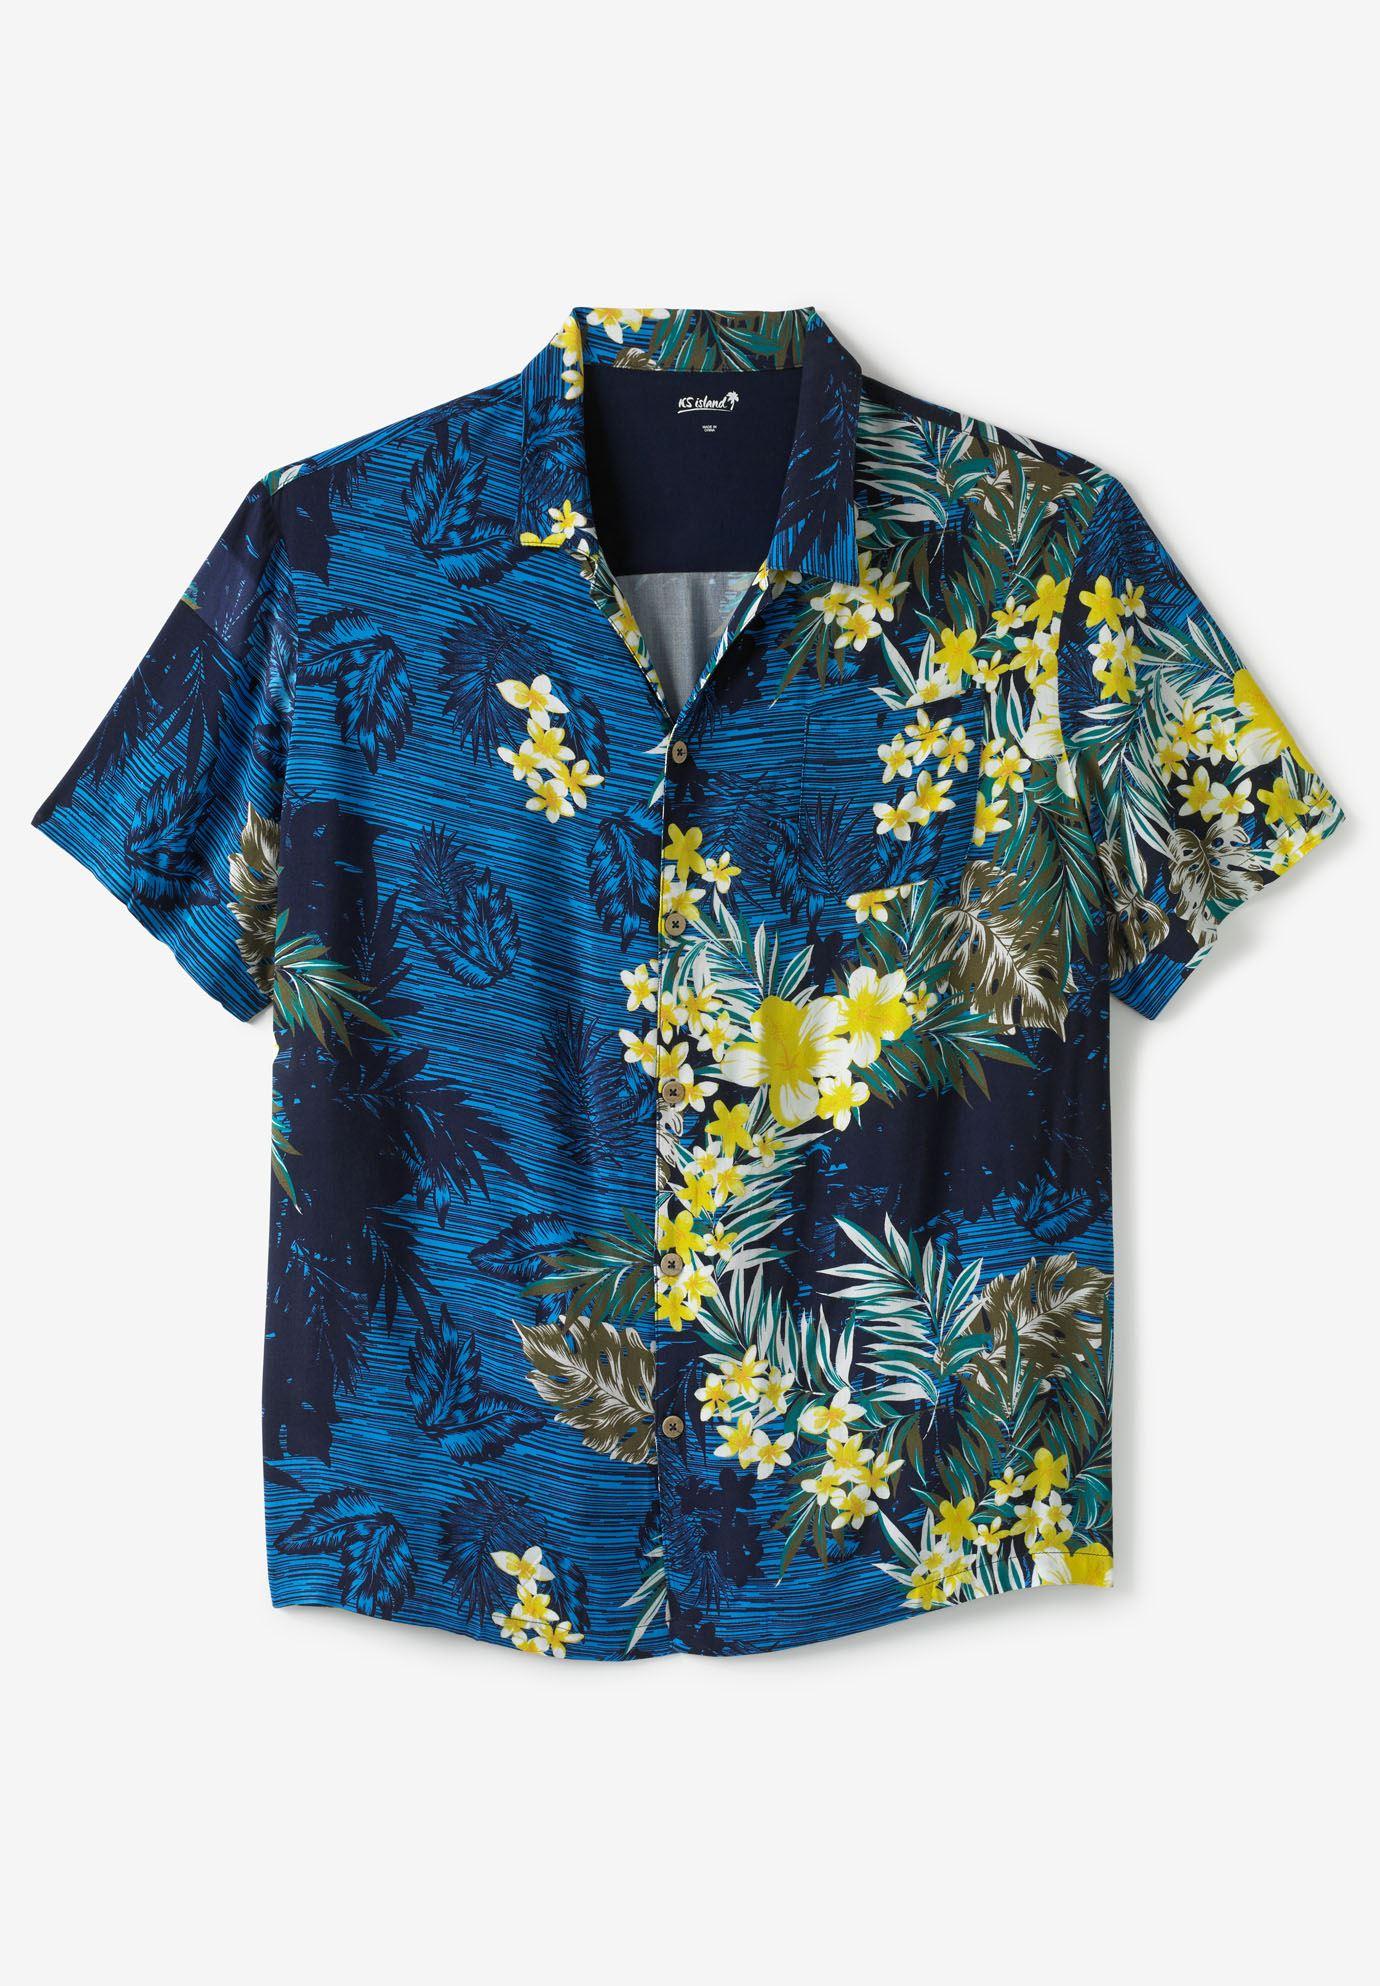 Tropical Caribbean Print Shirt By Ks Island Plus Size